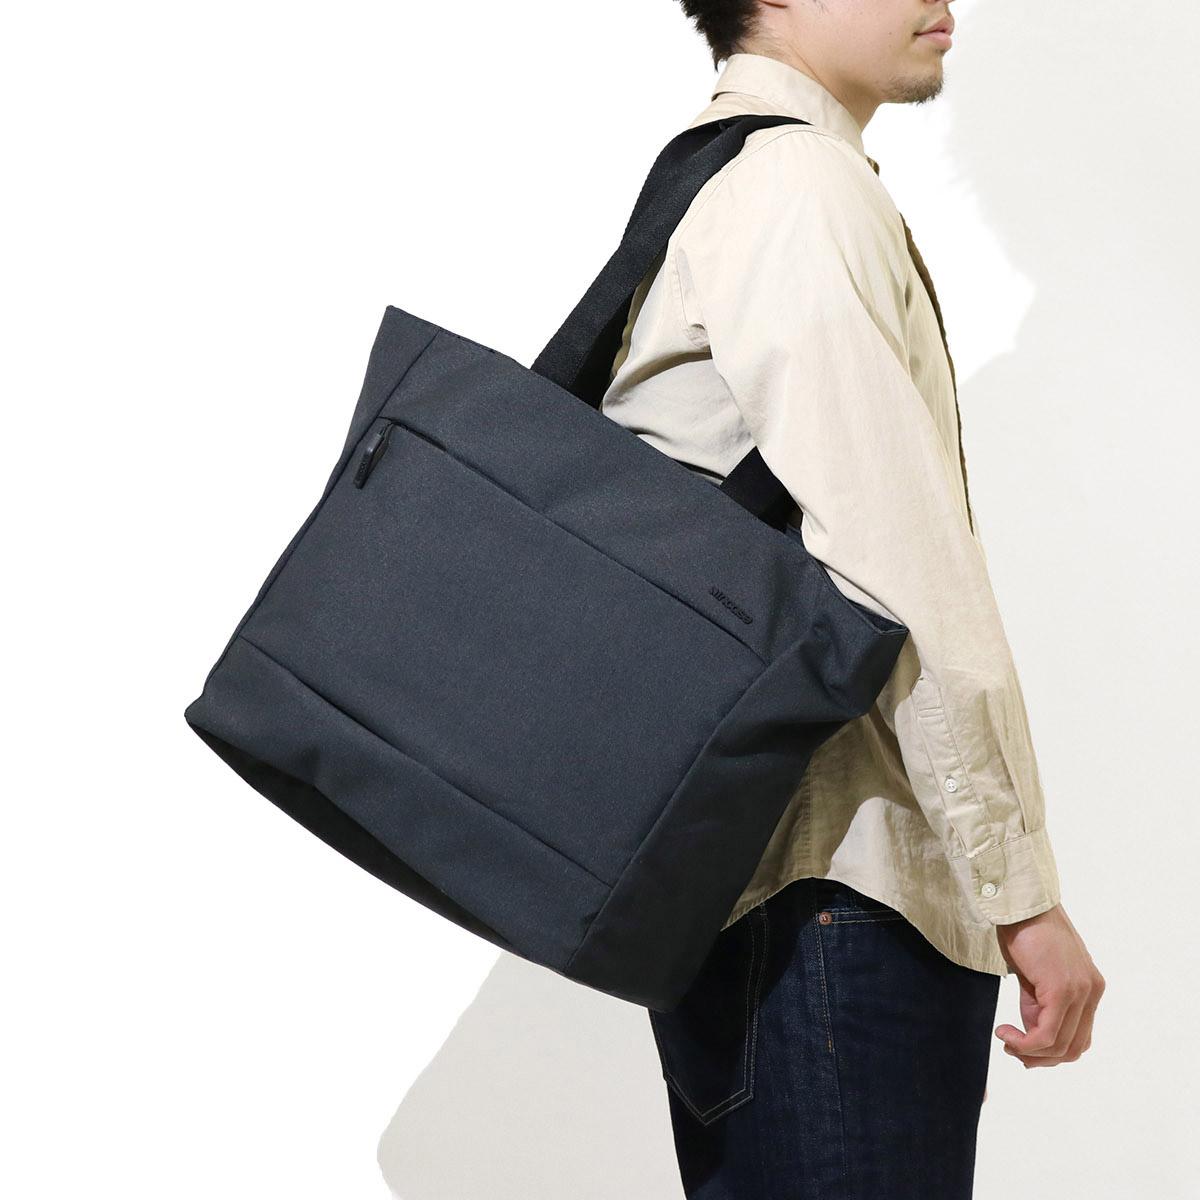 75 00 More Details Eagle Creek Mini Crossbody Rfid Black Fabric Handbags